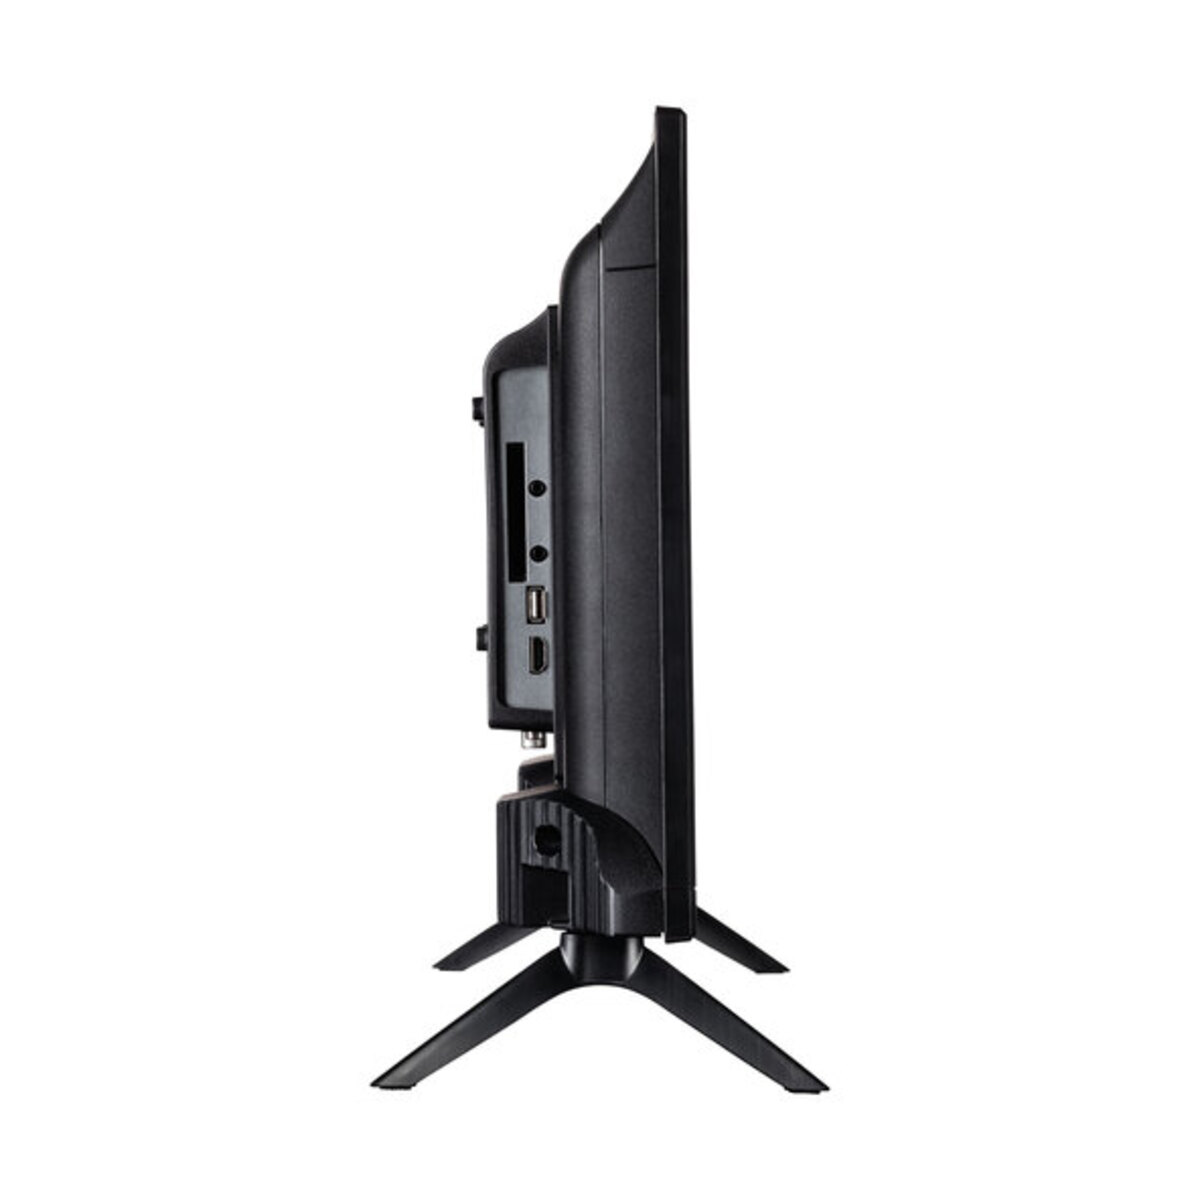 "Bild 5 von Full-HD LED-LCD-TV MEDION® LIFE® E12423 (MD 21733), 60,5 cm (23,8"")"